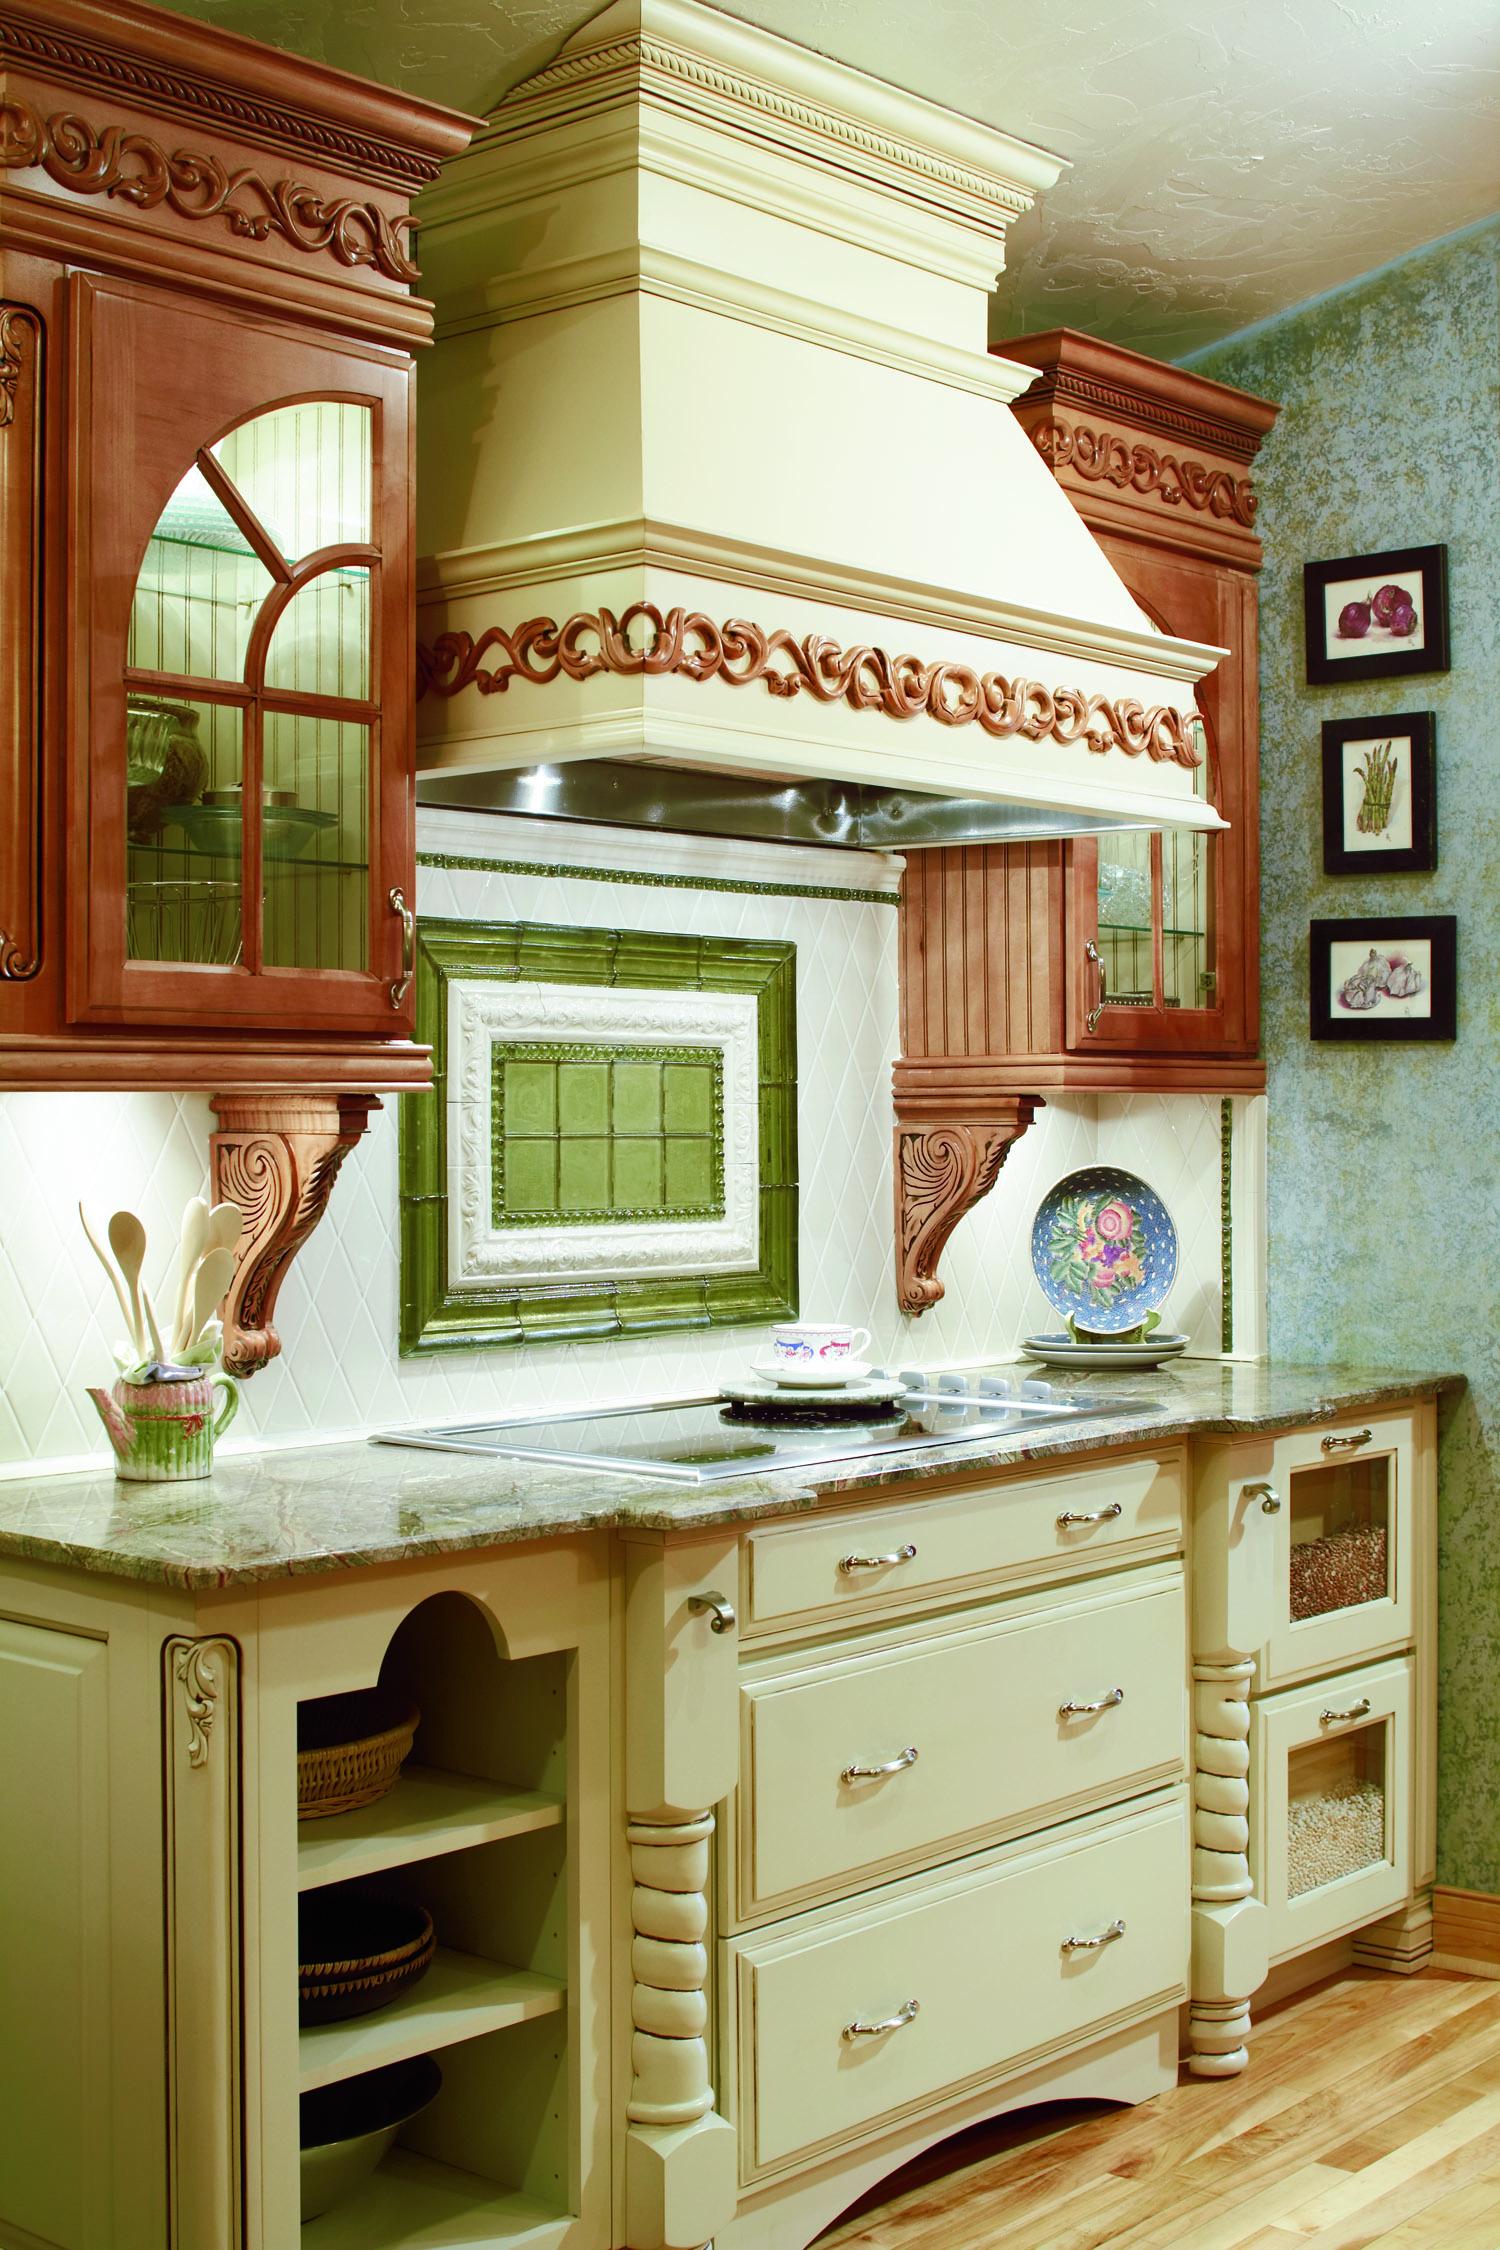 SVS_MPL_MCR and CIN Kitchen.jpg